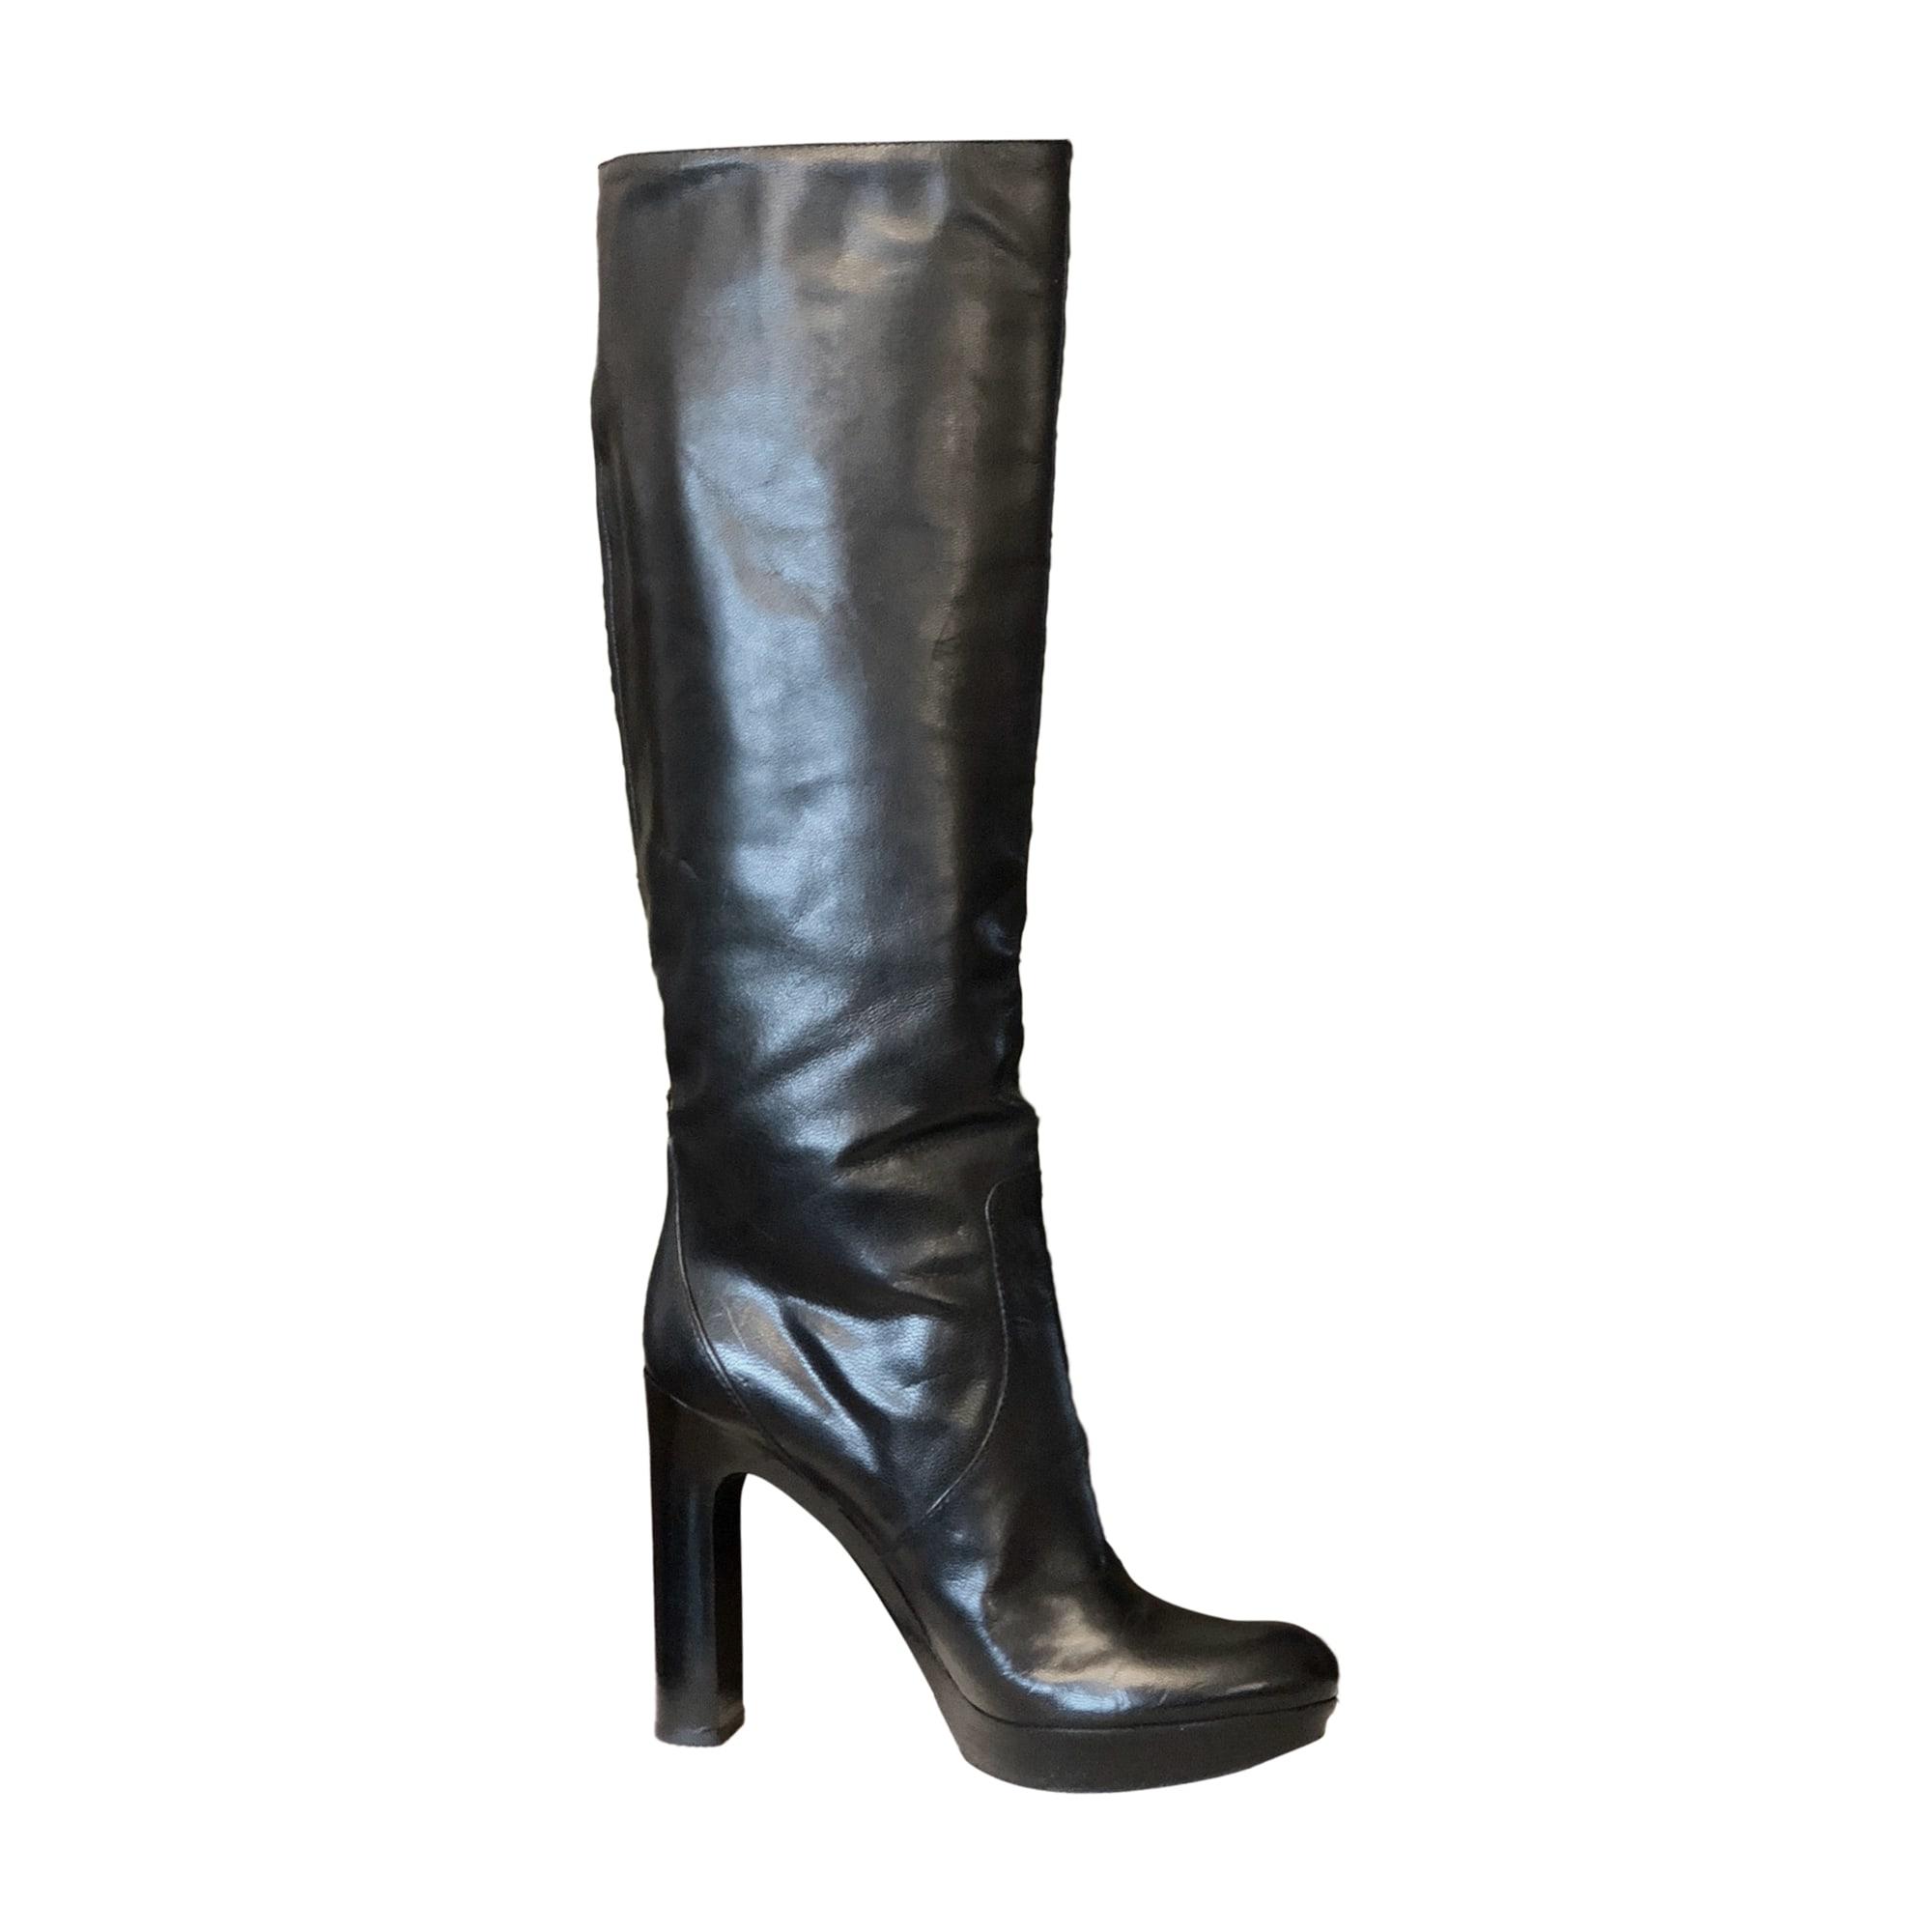 High Heel Boots GUCCI Black